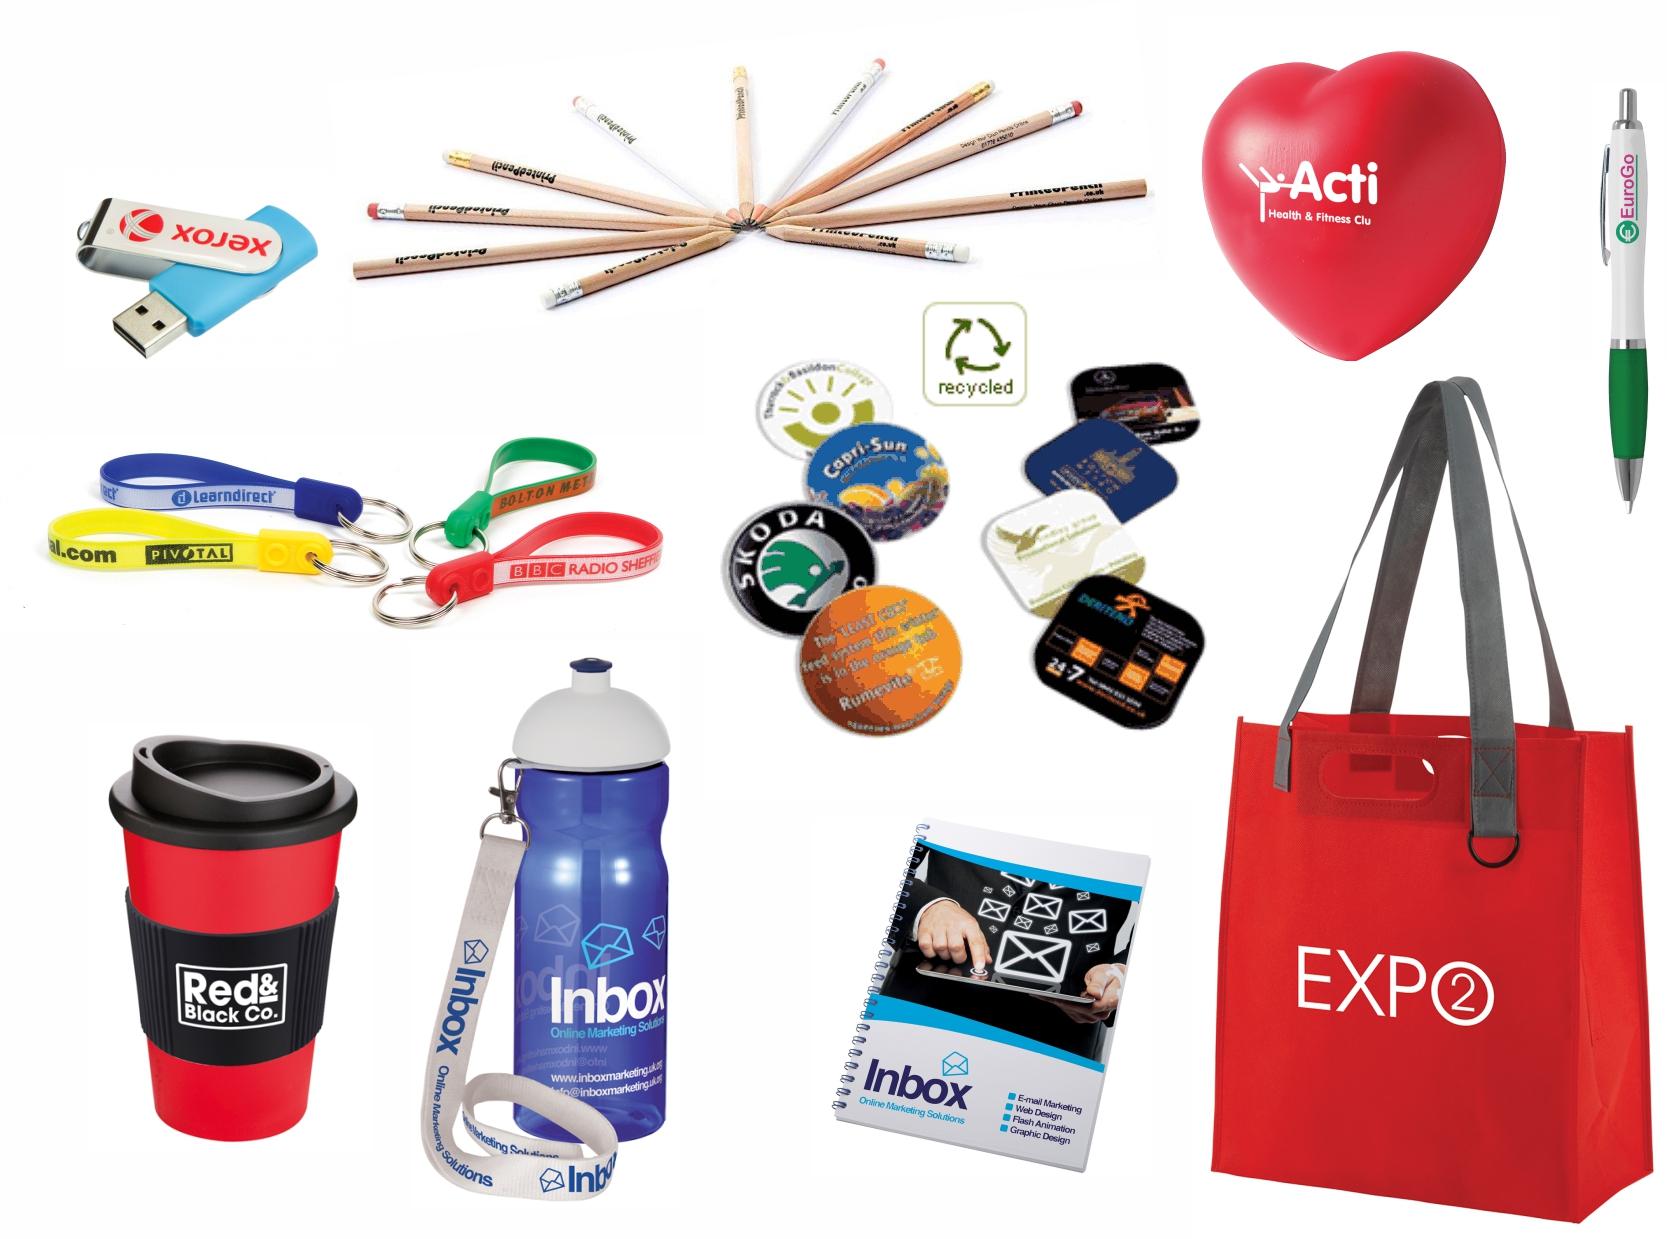 Exhibition gift ideas